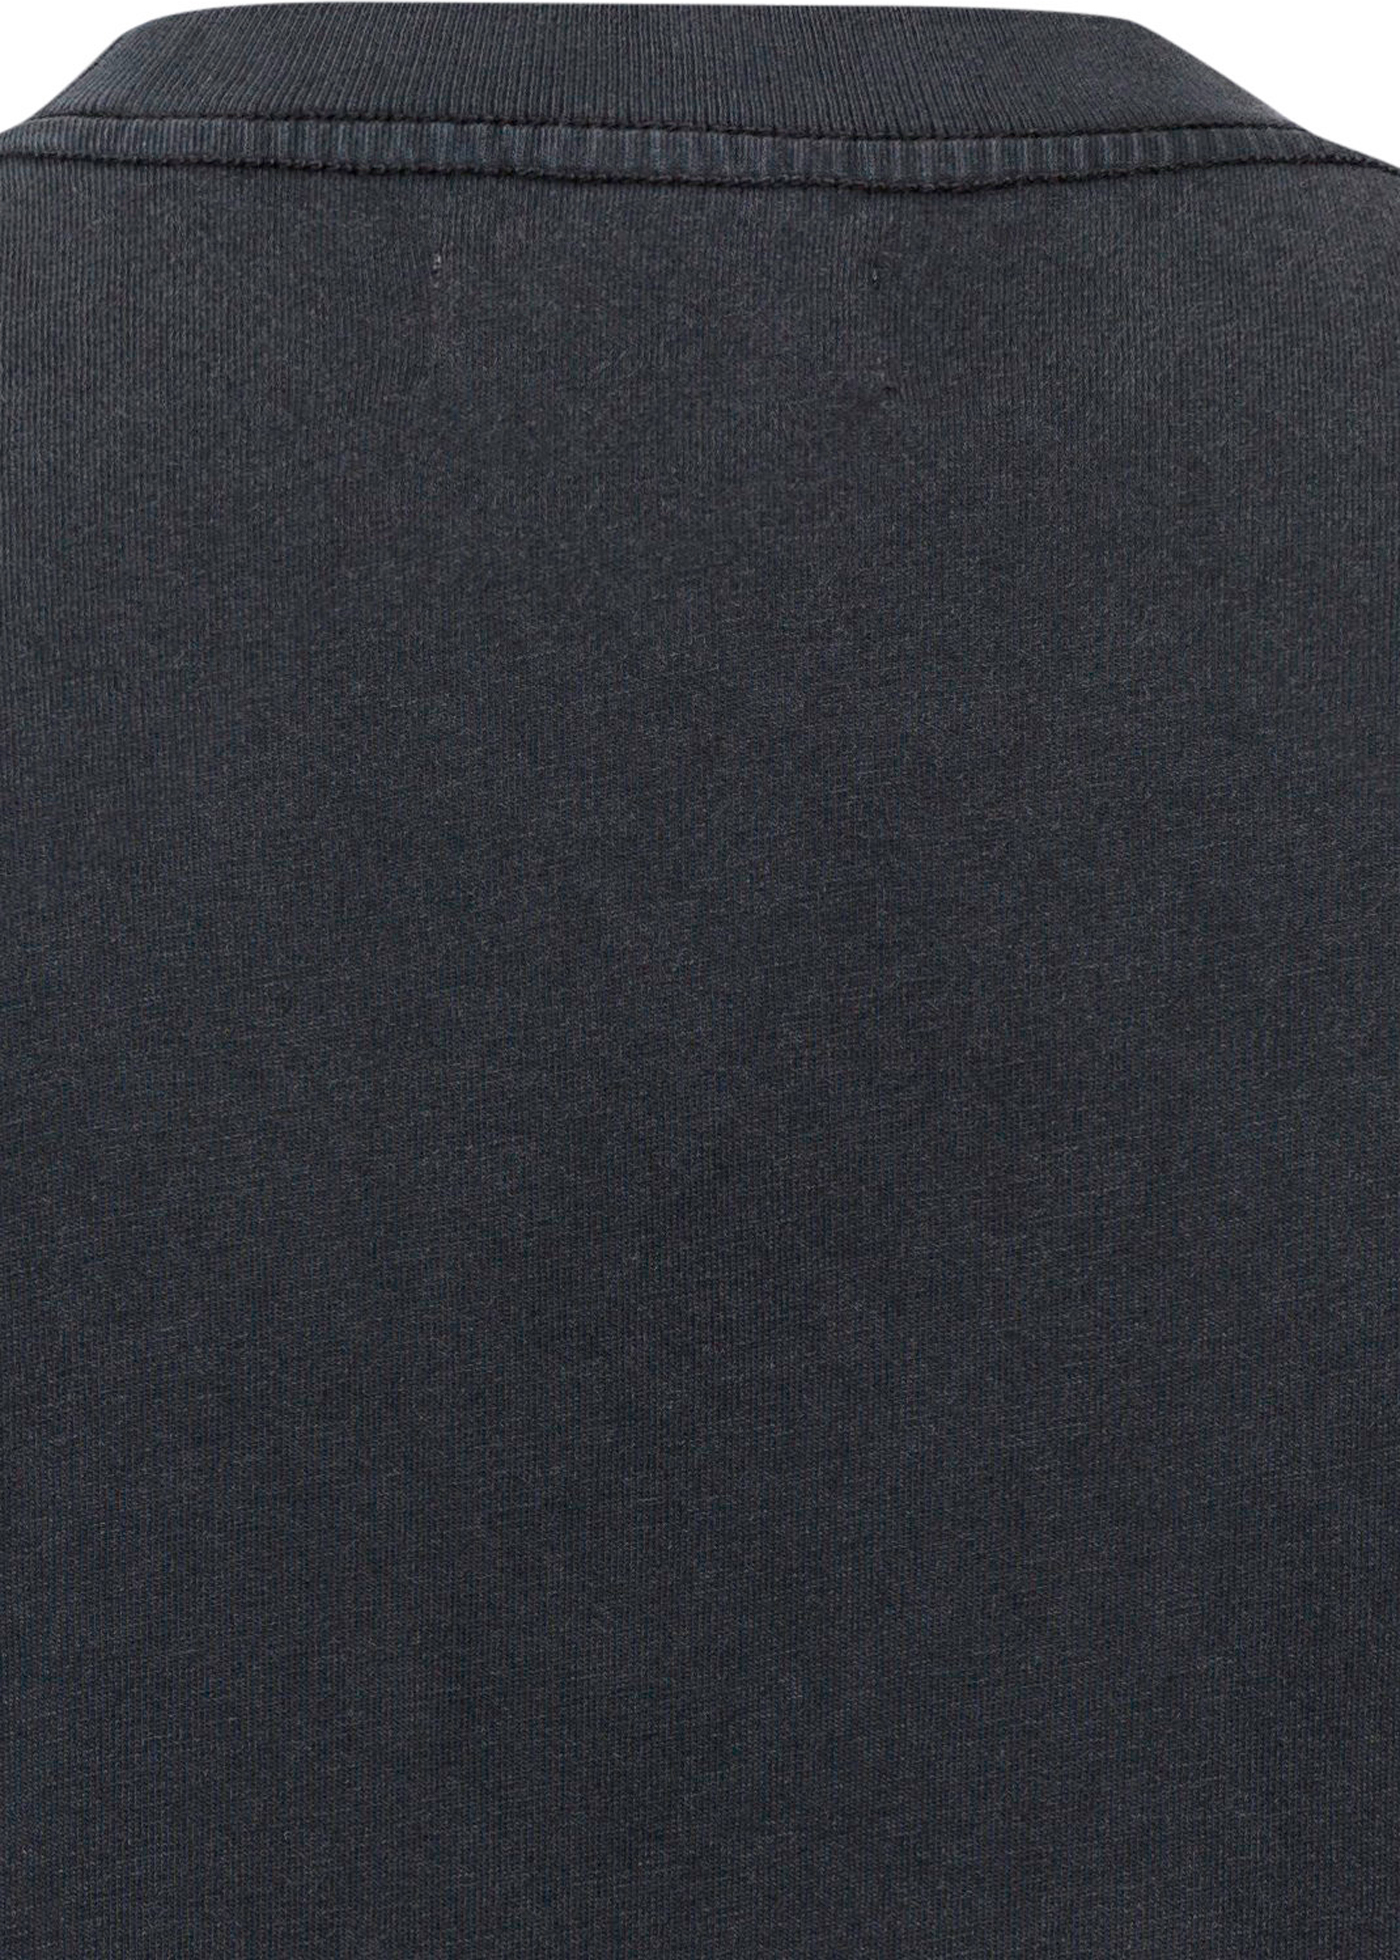 LILI TEE EAGLE - WASHED BLACK image number 3